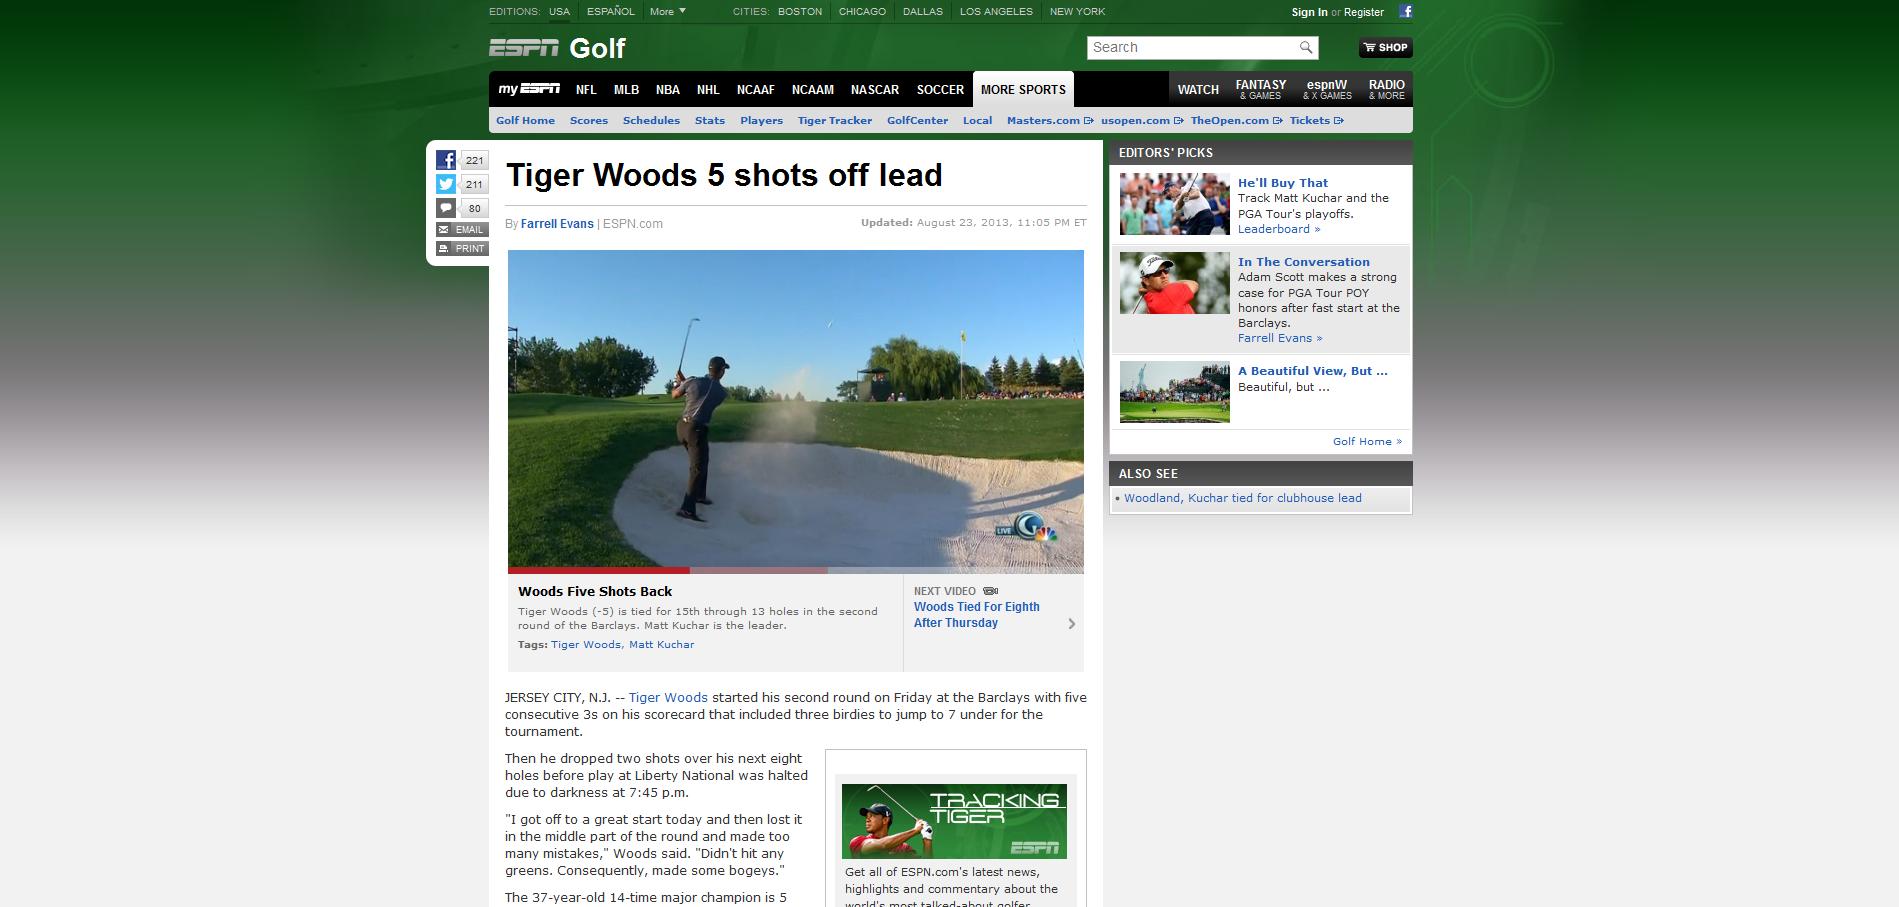 Tiger Woods 5 shots off lead http://espn.go.com/golf/story/_/id ...